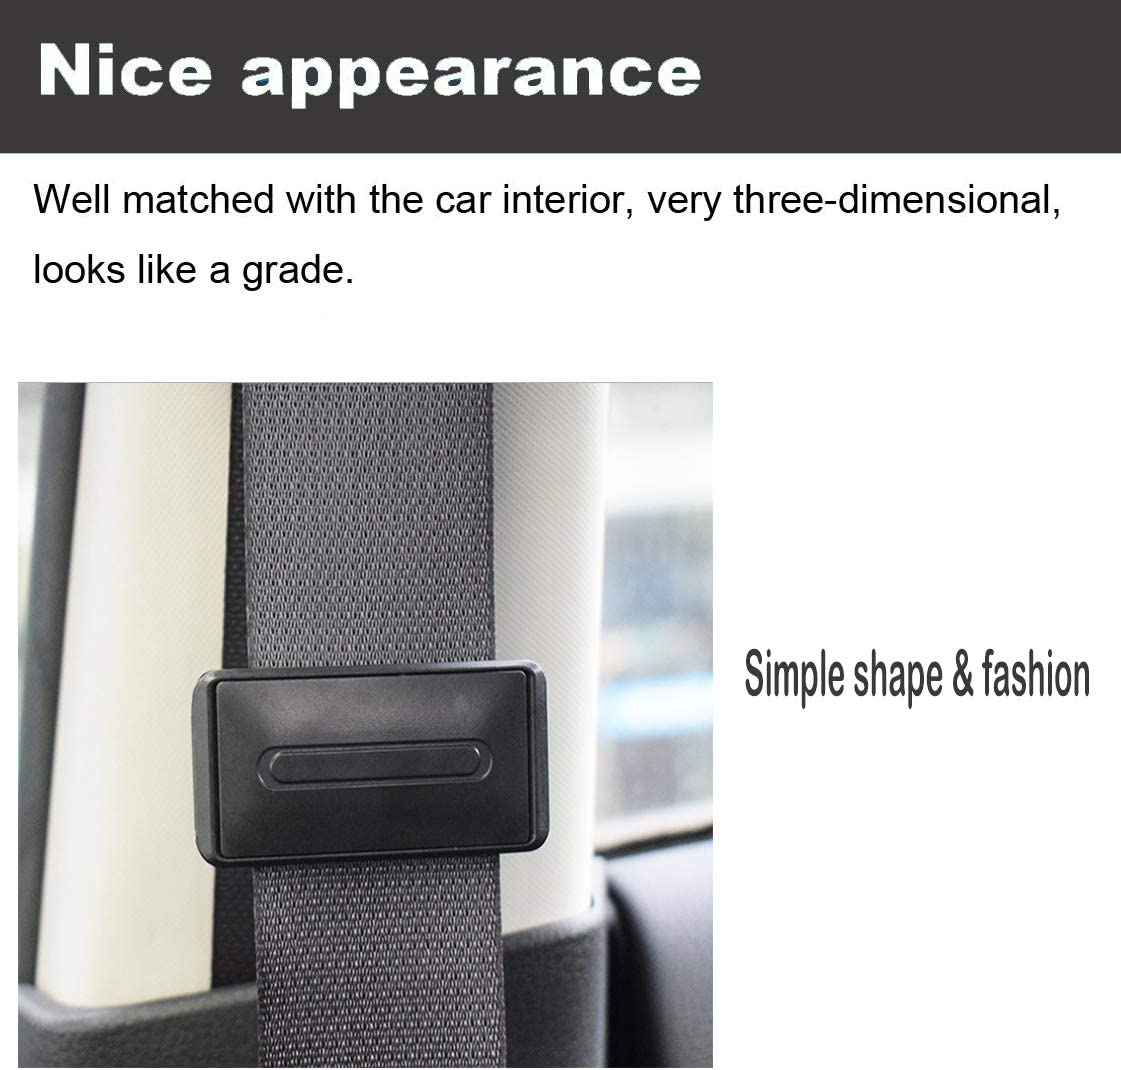 Children iwobi 2 Pcs Seat Belt Adjuster,Car Seatbelt Clips to Relax Shoulder Neck Convenient for The Elderly Pregnant Women